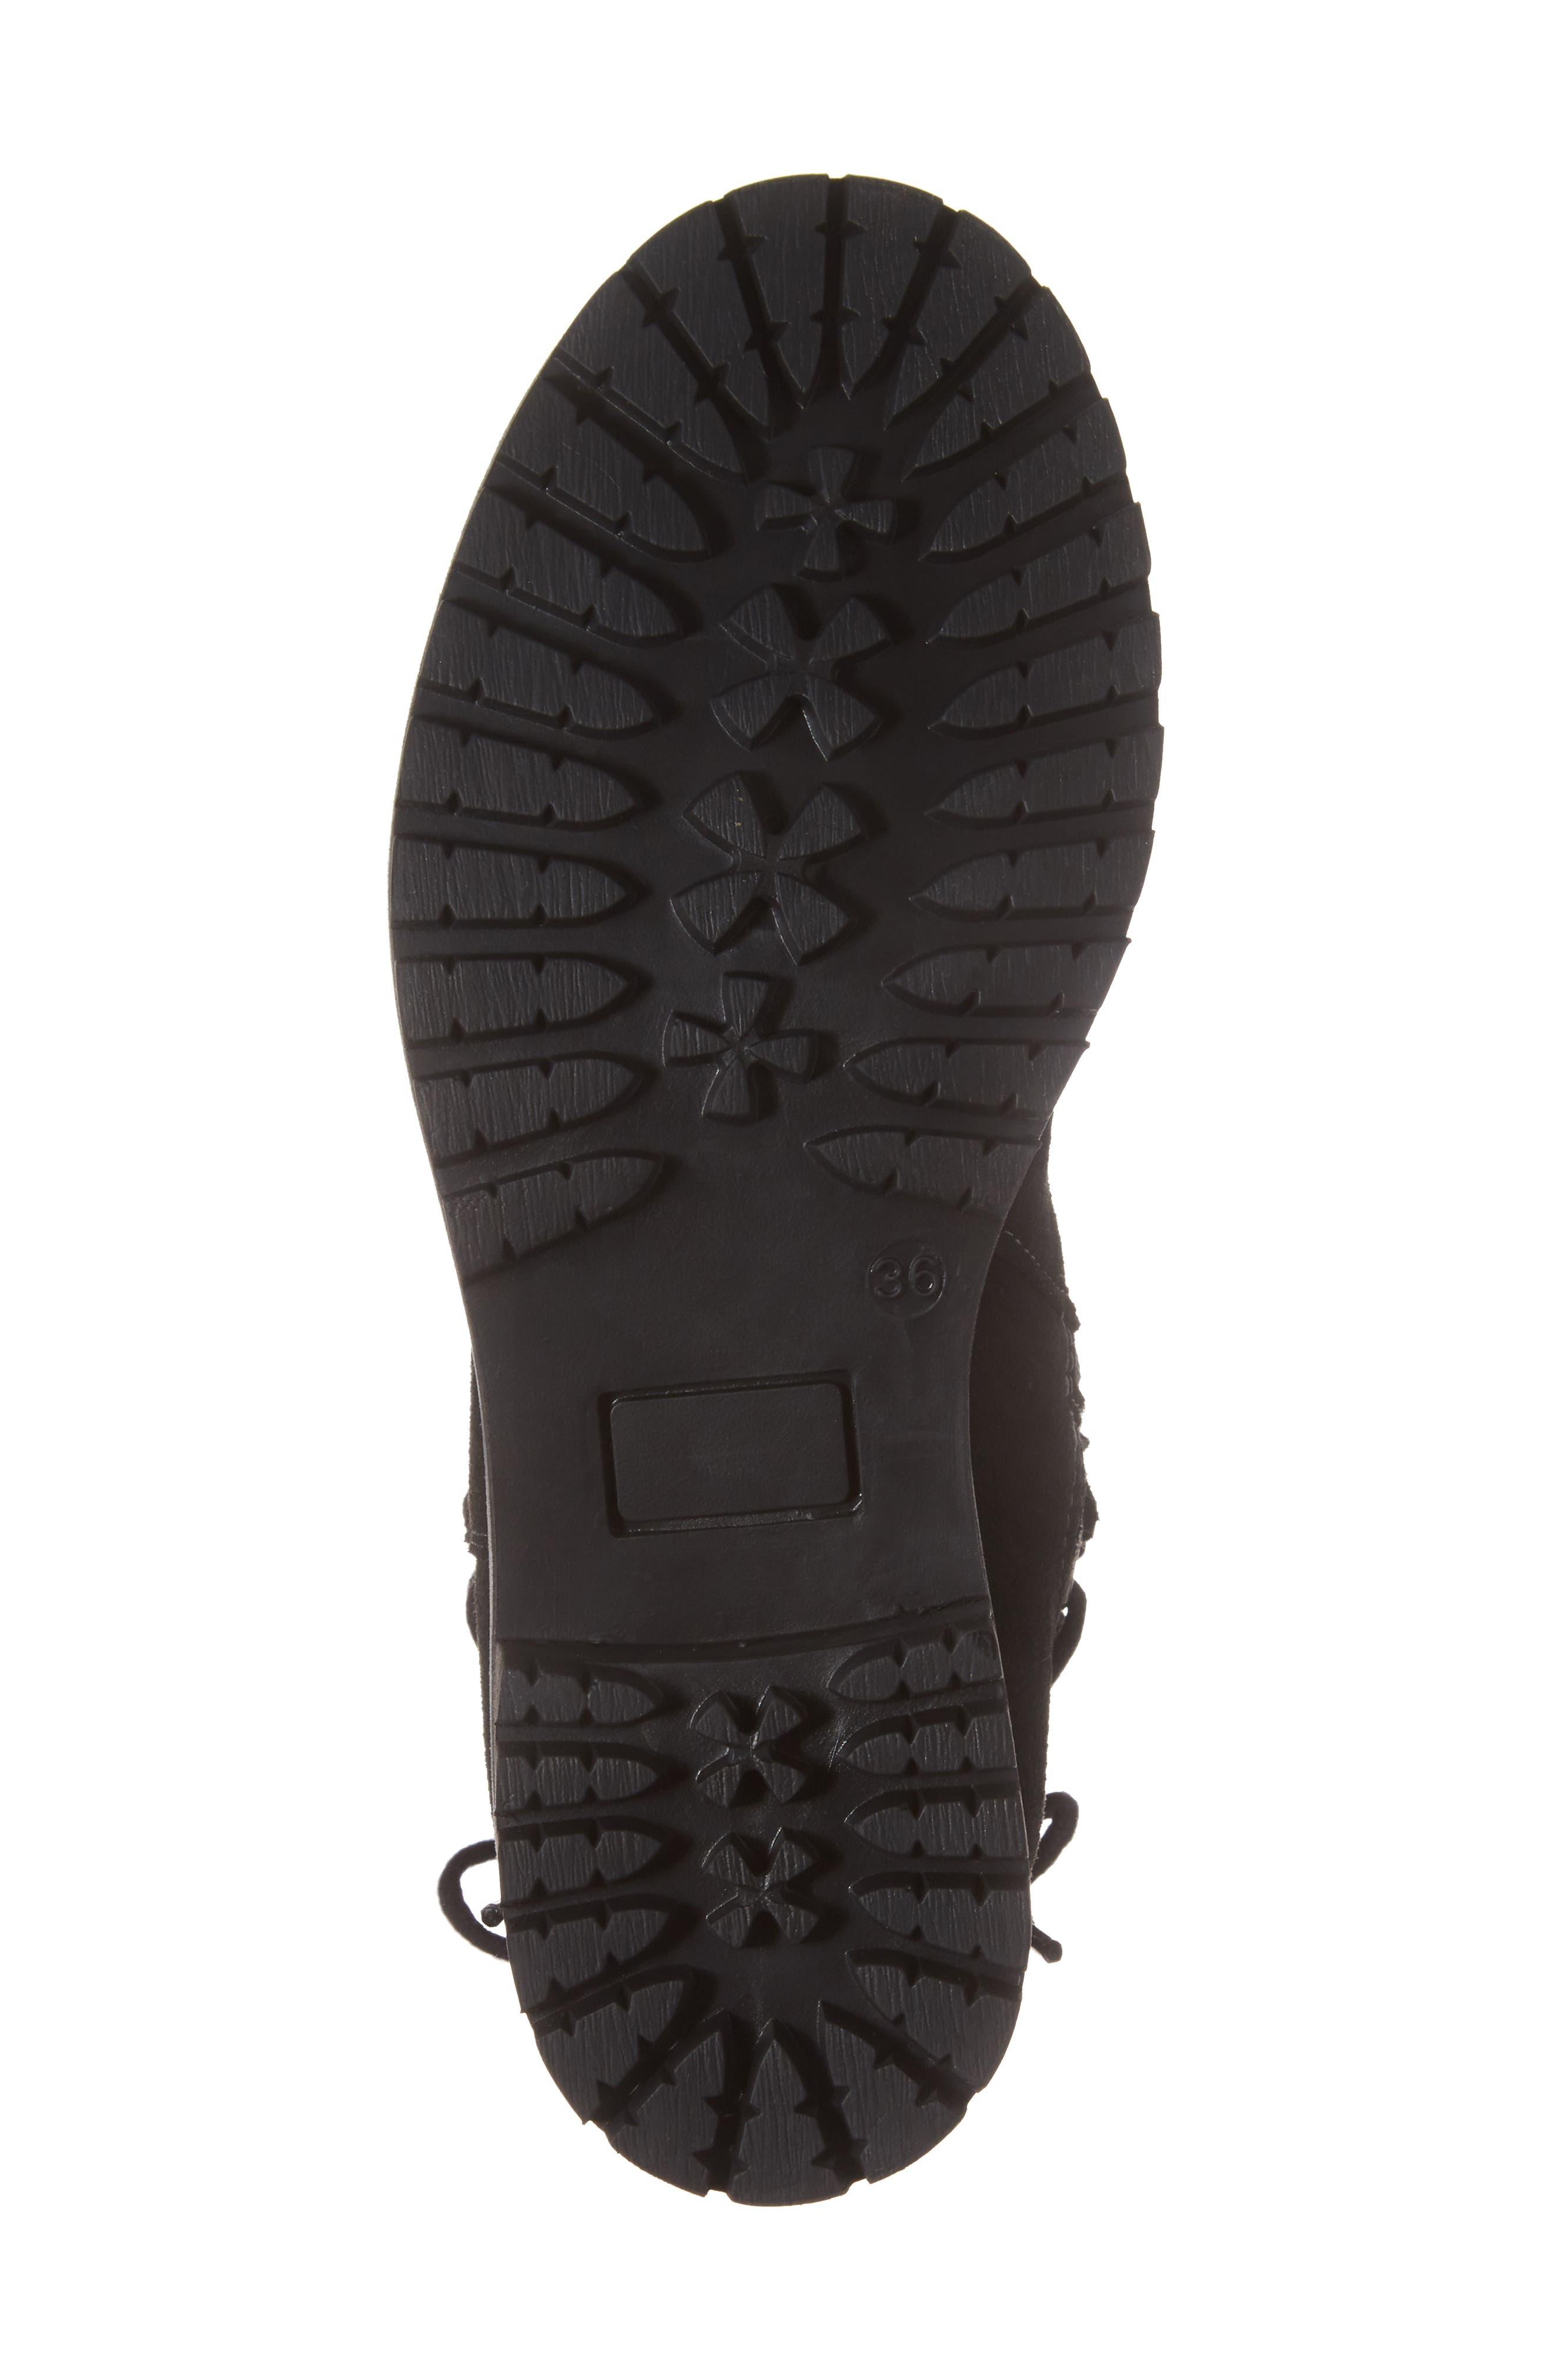 Cascade Waterproof Boot,                             Alternate thumbnail 6, color,                             Black/ Grey Suede